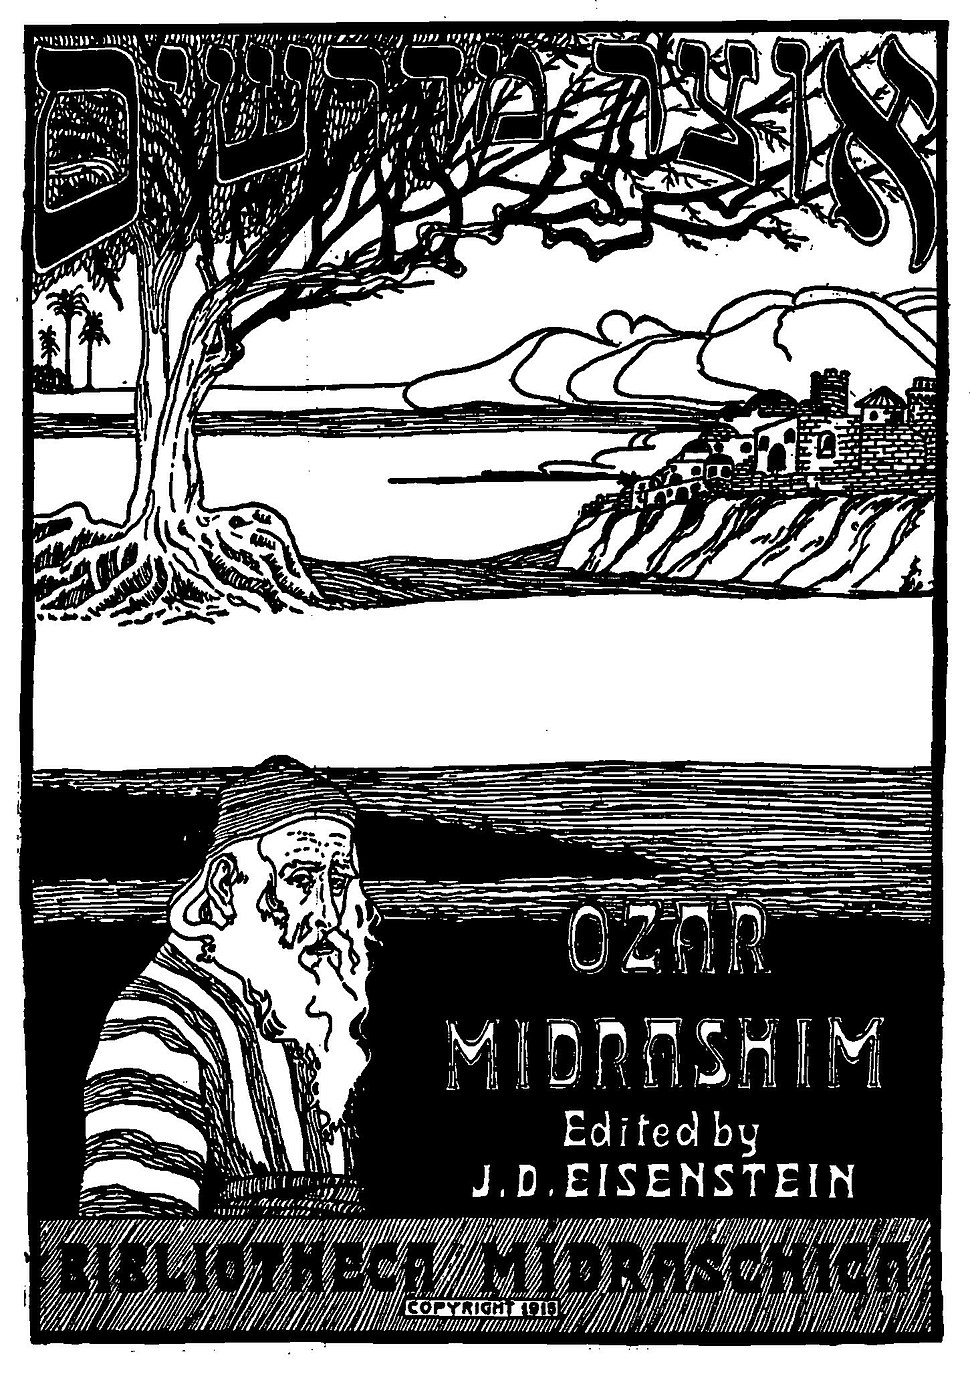 Ozar Midrashim